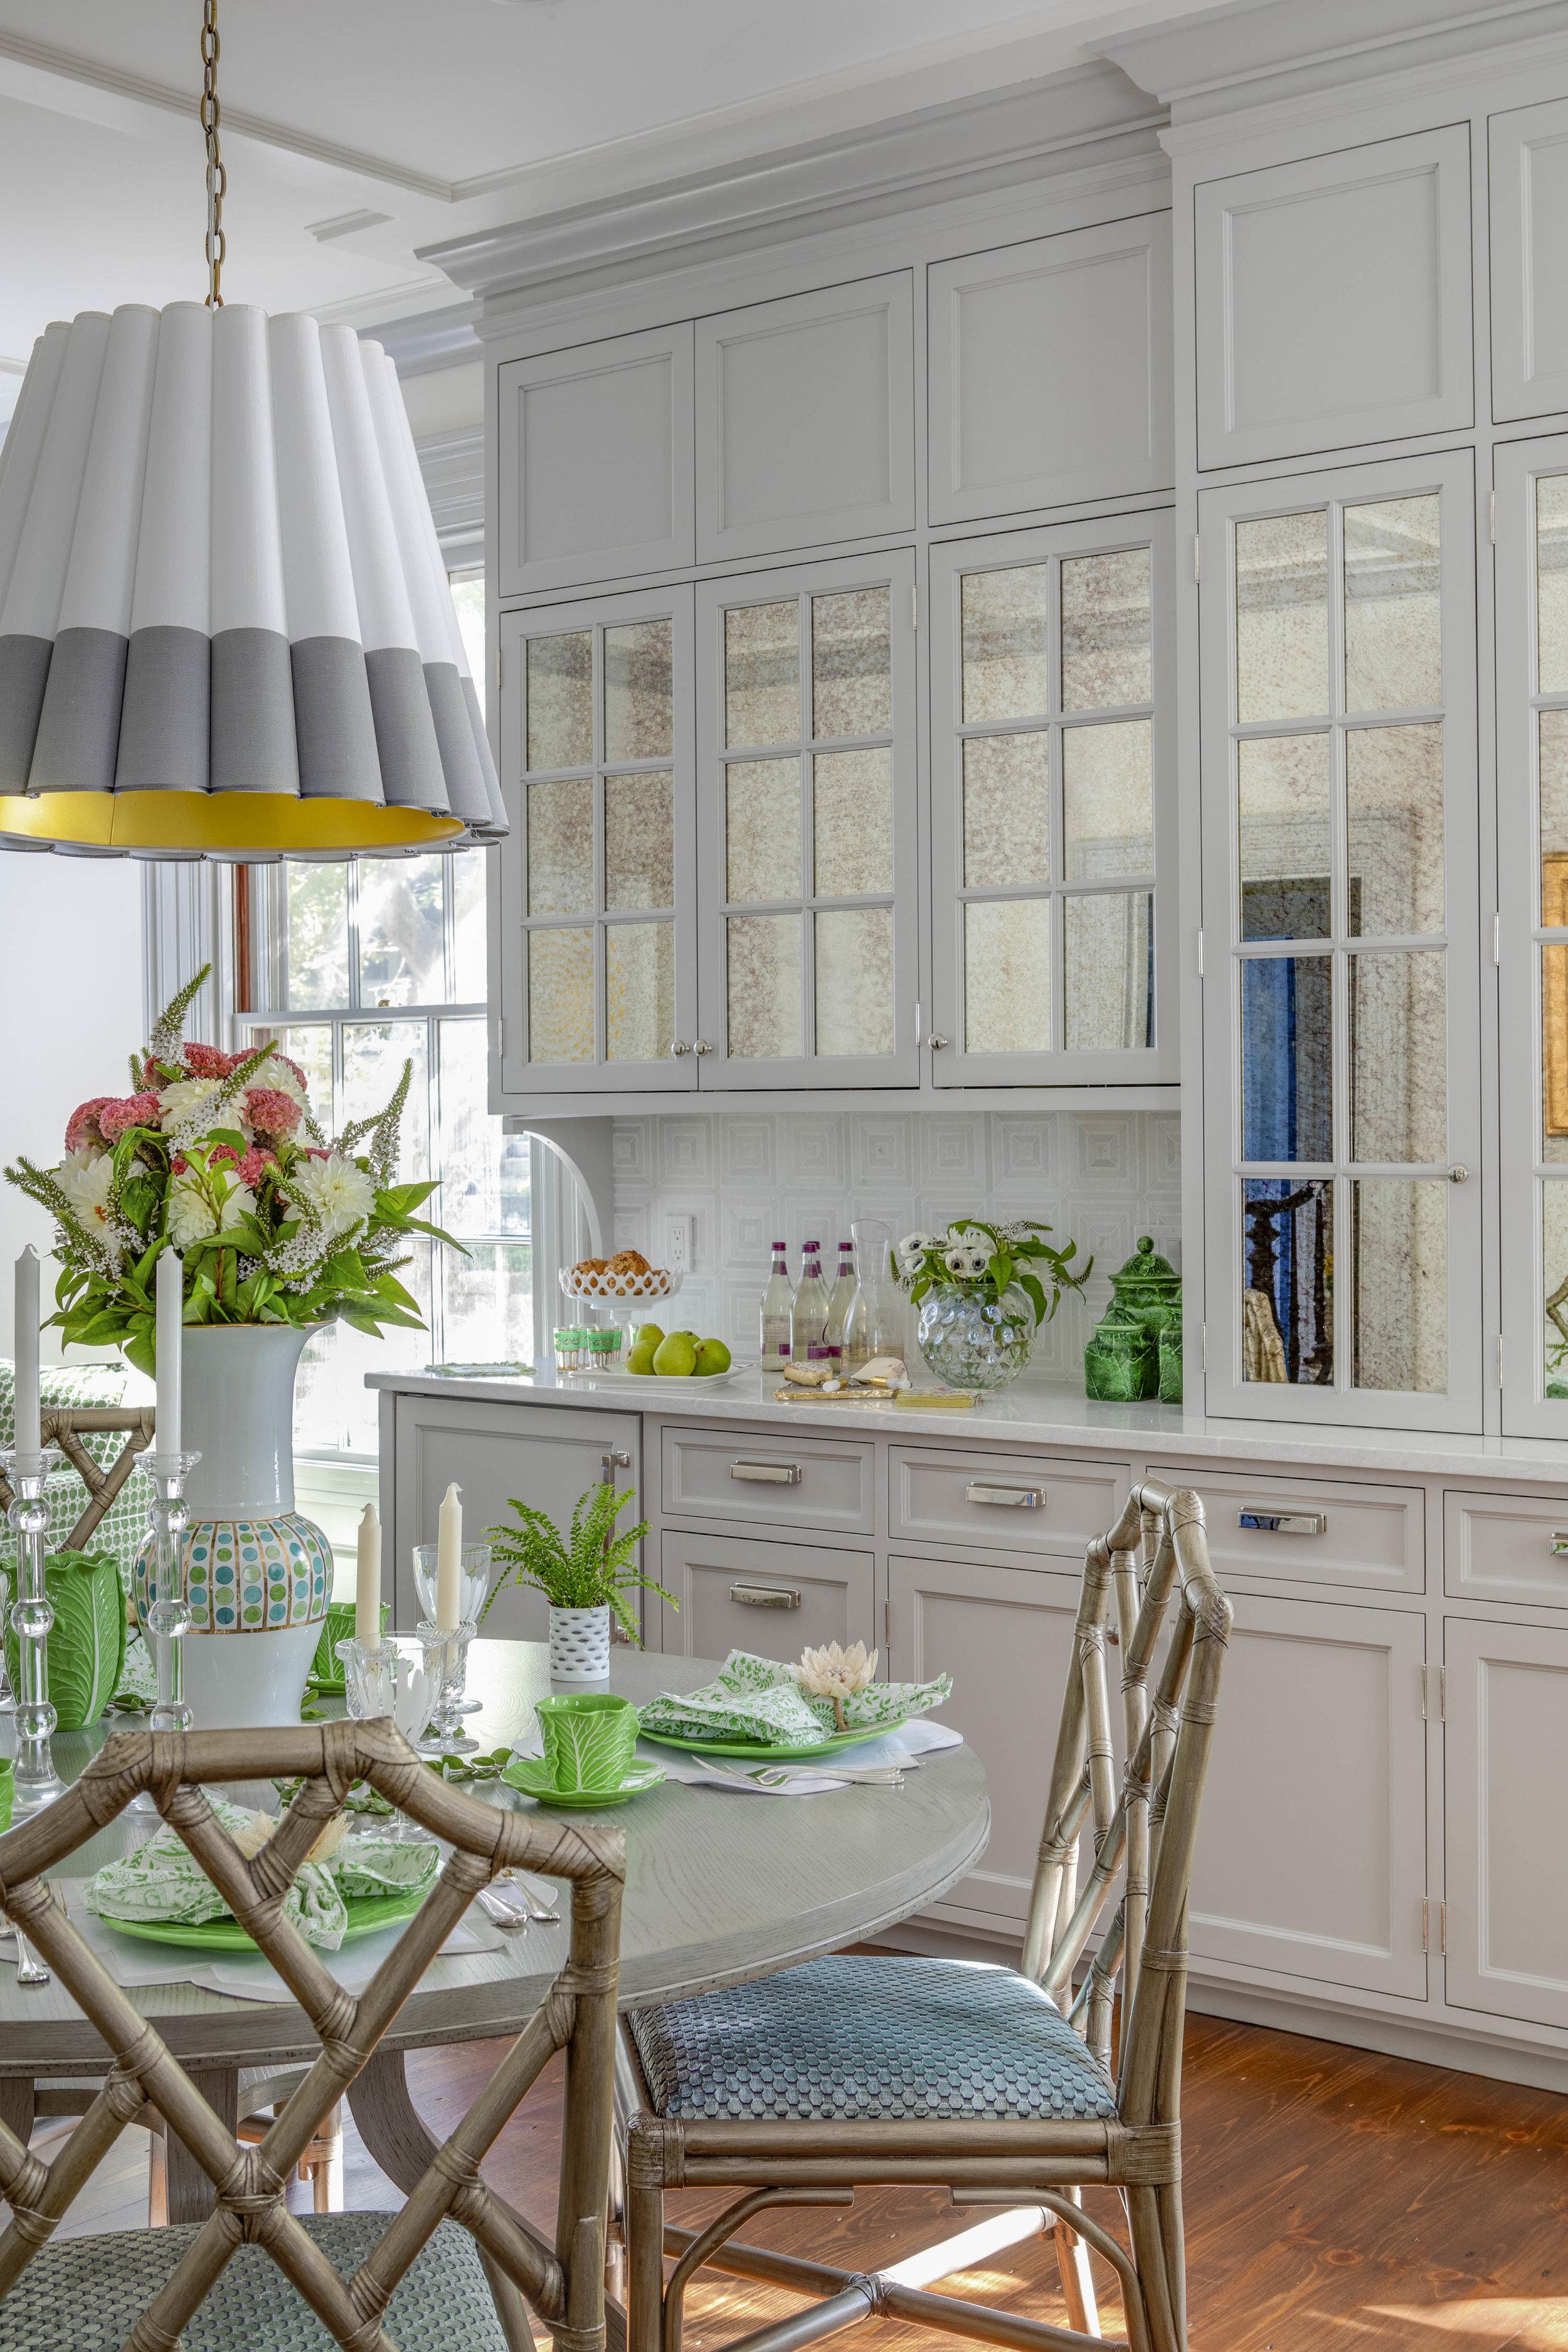 Benefit Street, Providence, Rhode Island, gray cabinets, kitchen design, bar, kitchen cabinets, mirror front cabinets, interior design, jocelyn chiappone, digs design, digs interior design, digs design company